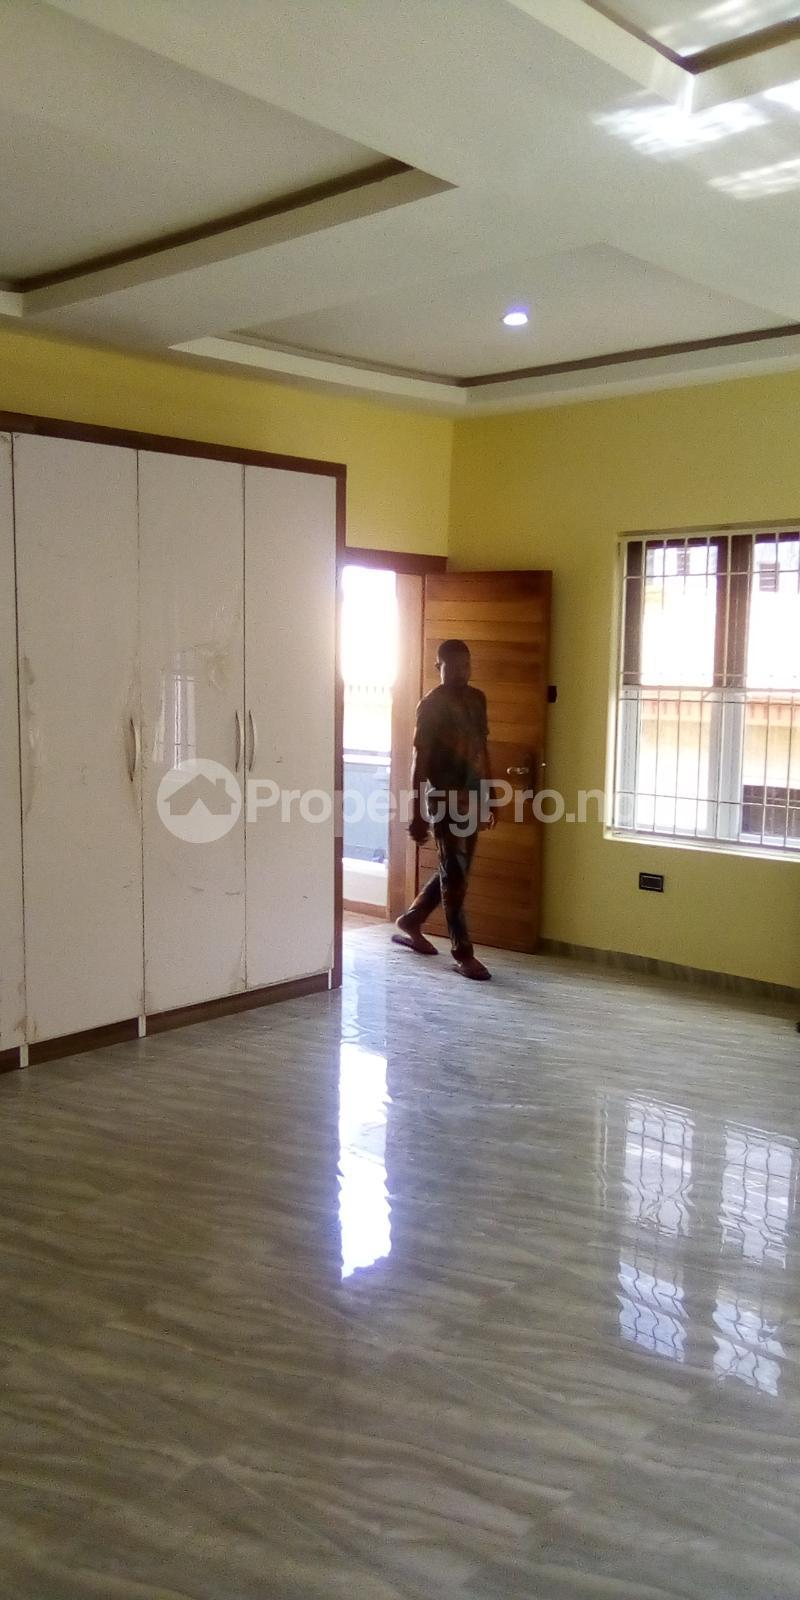 5 bedroom Detached Duplex for sale Southern View Oral Estate Lekki Lagos - 8